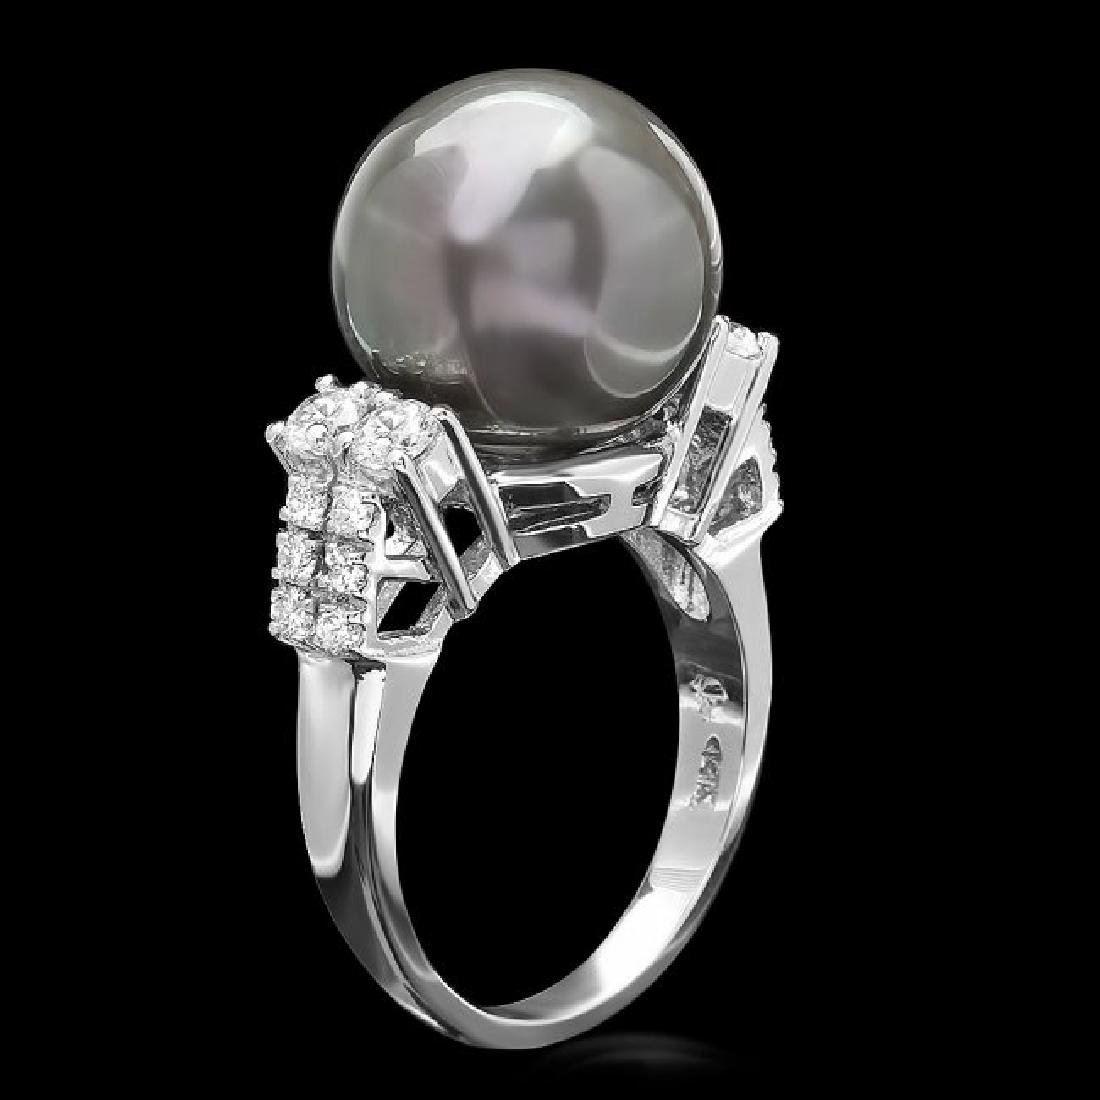 14k Gold 13 X 13mm Pearl 0.70ct Diamond Ring - 2